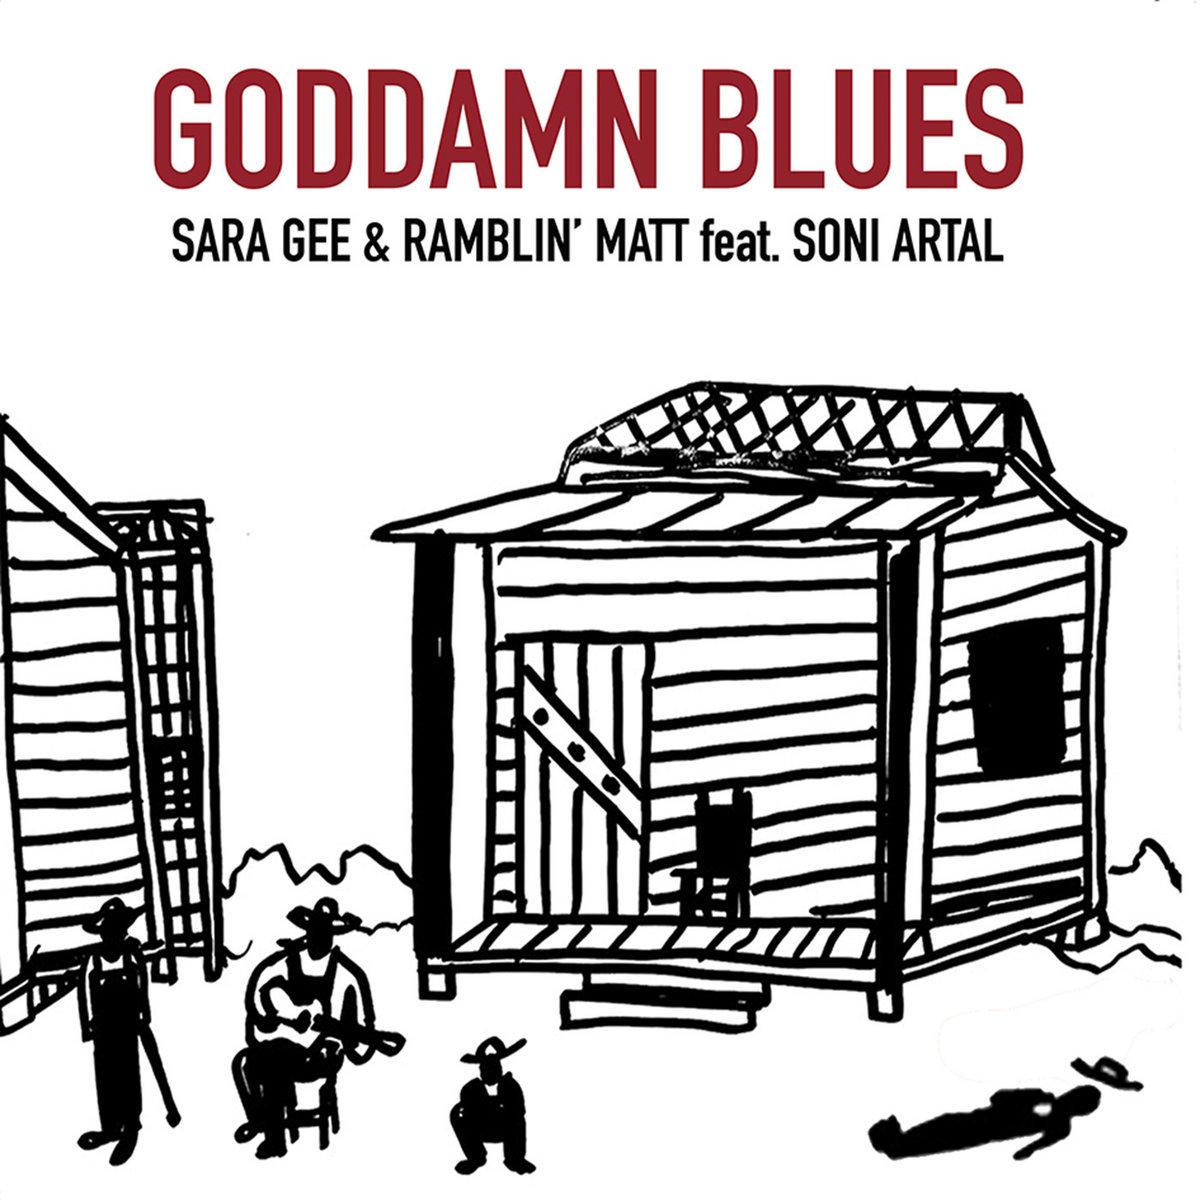 Sara Gee & Ramblin Matt feat. Soni Artal - Goddamn Blues (2020)